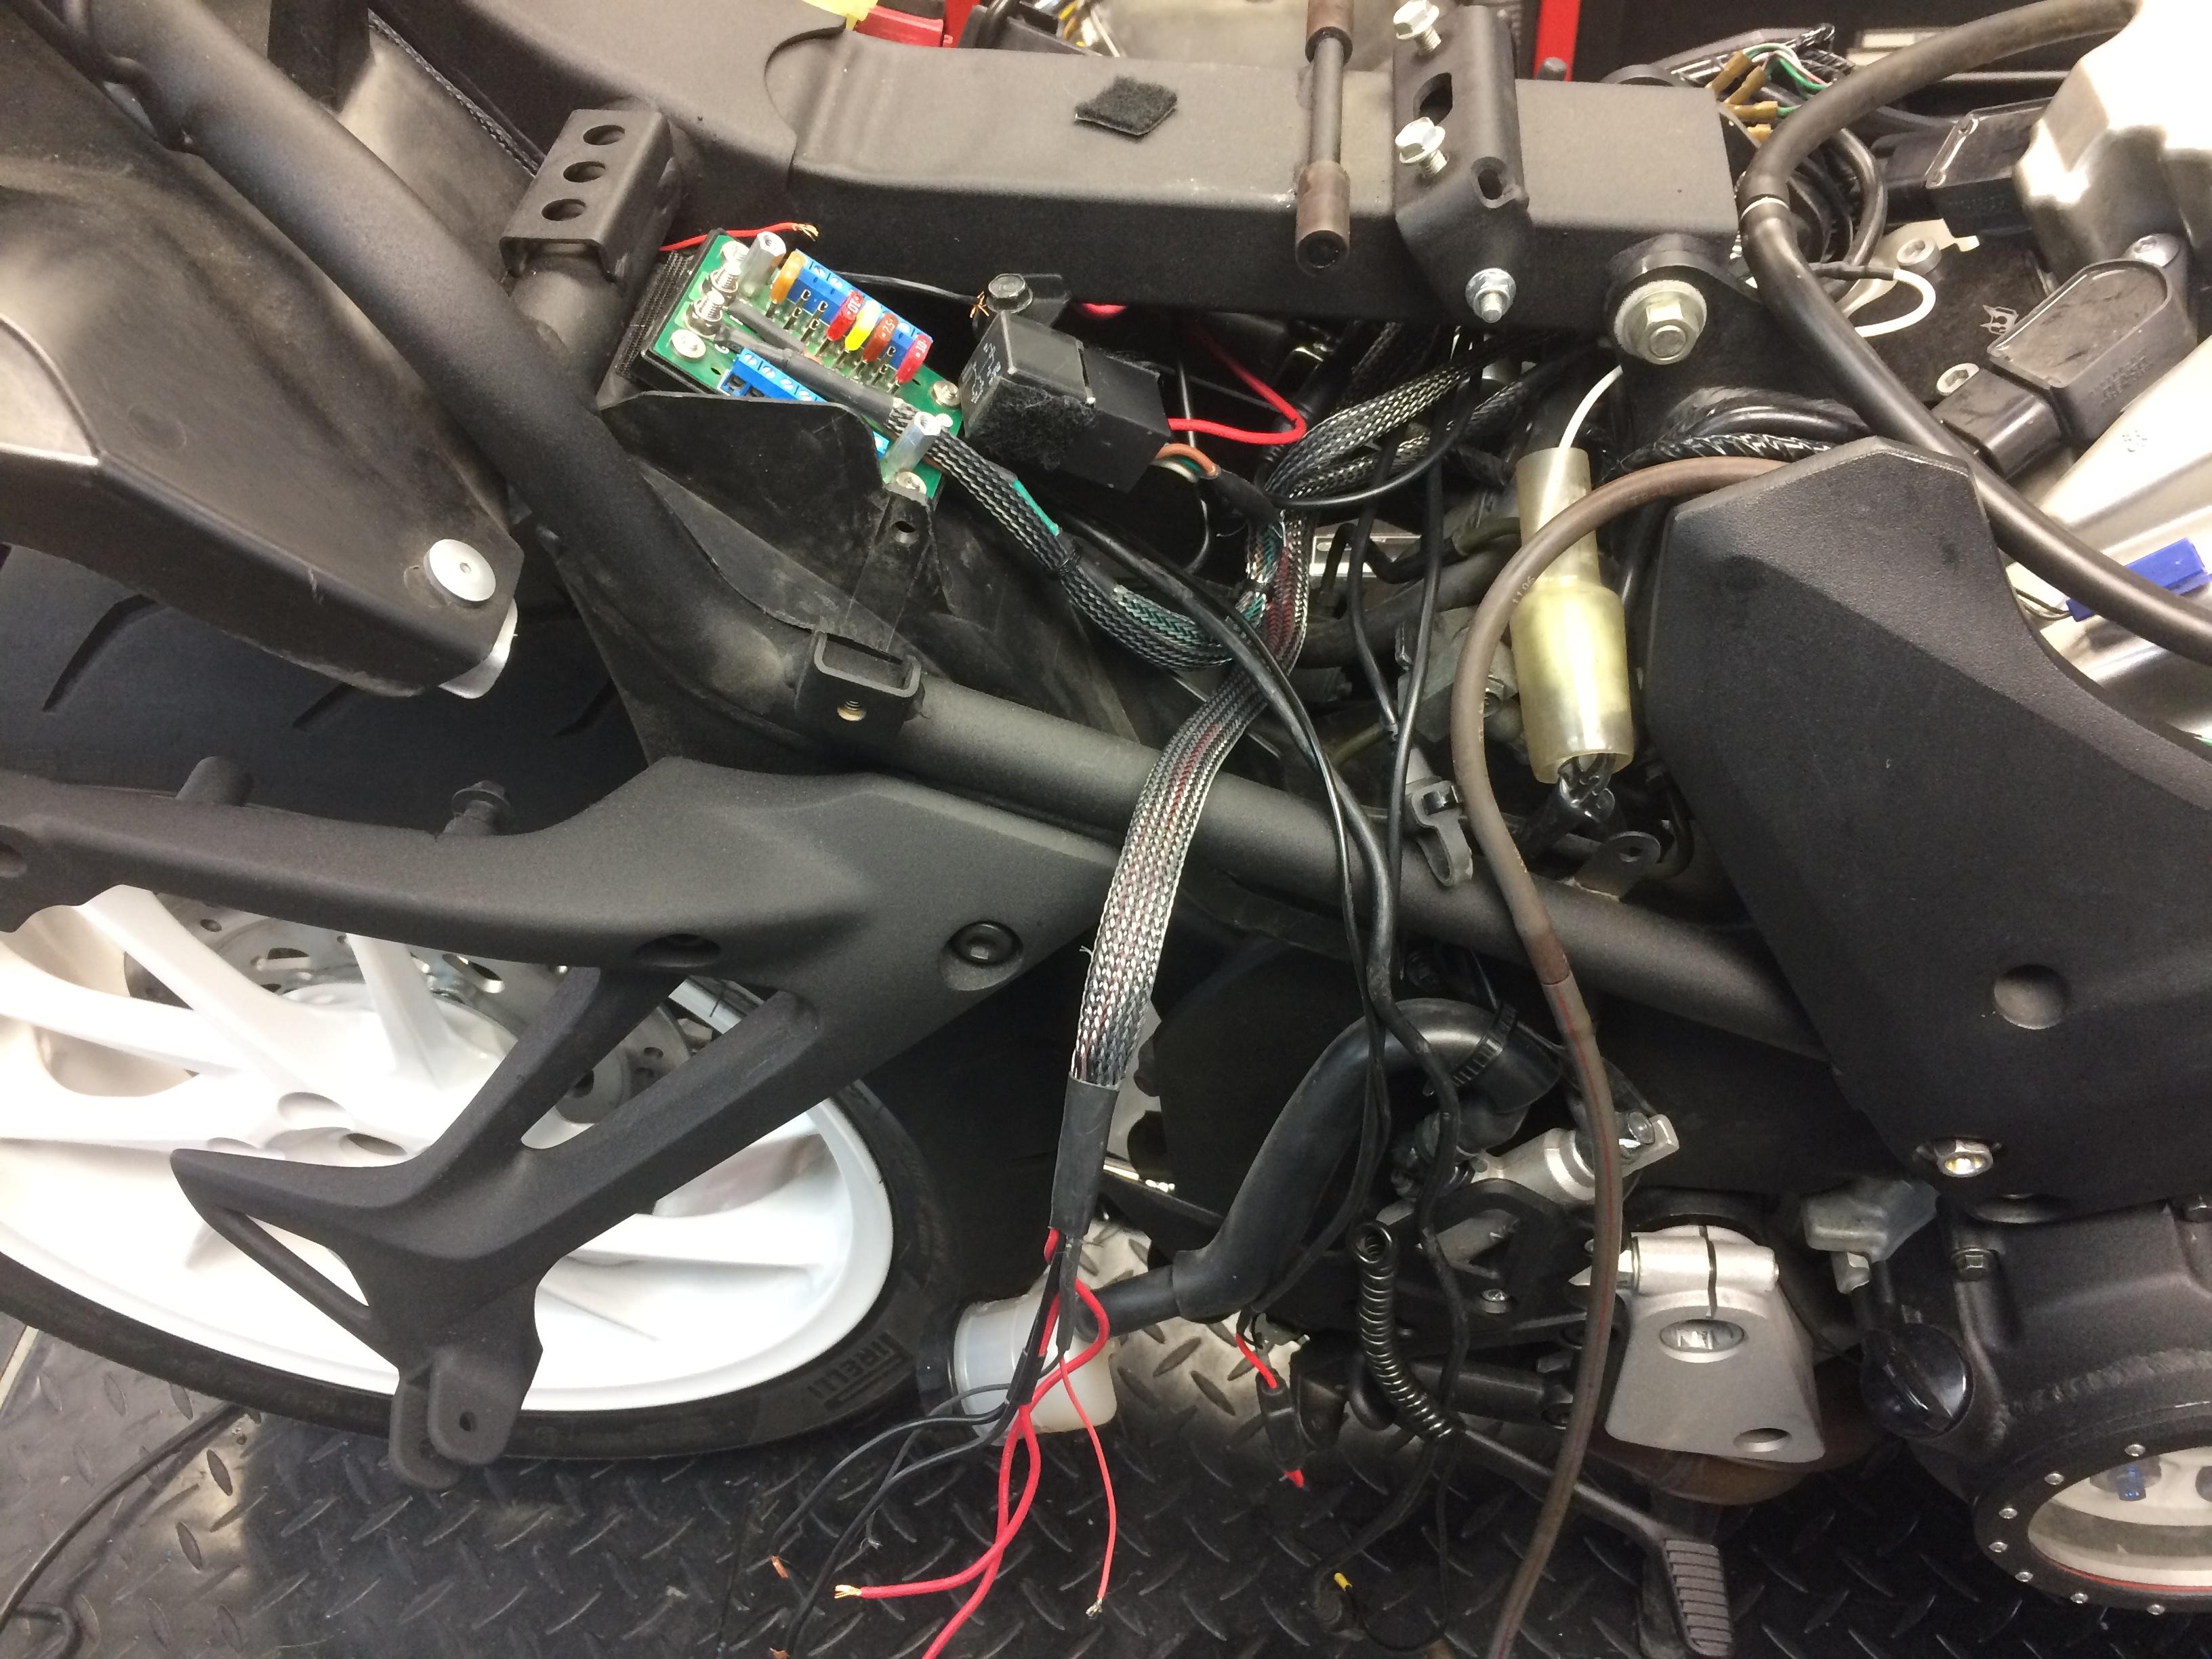 appealing 2001 honda rc51 wiring diagram gallery best image wire 99 honda  rc51 breathtaking 2000 honda